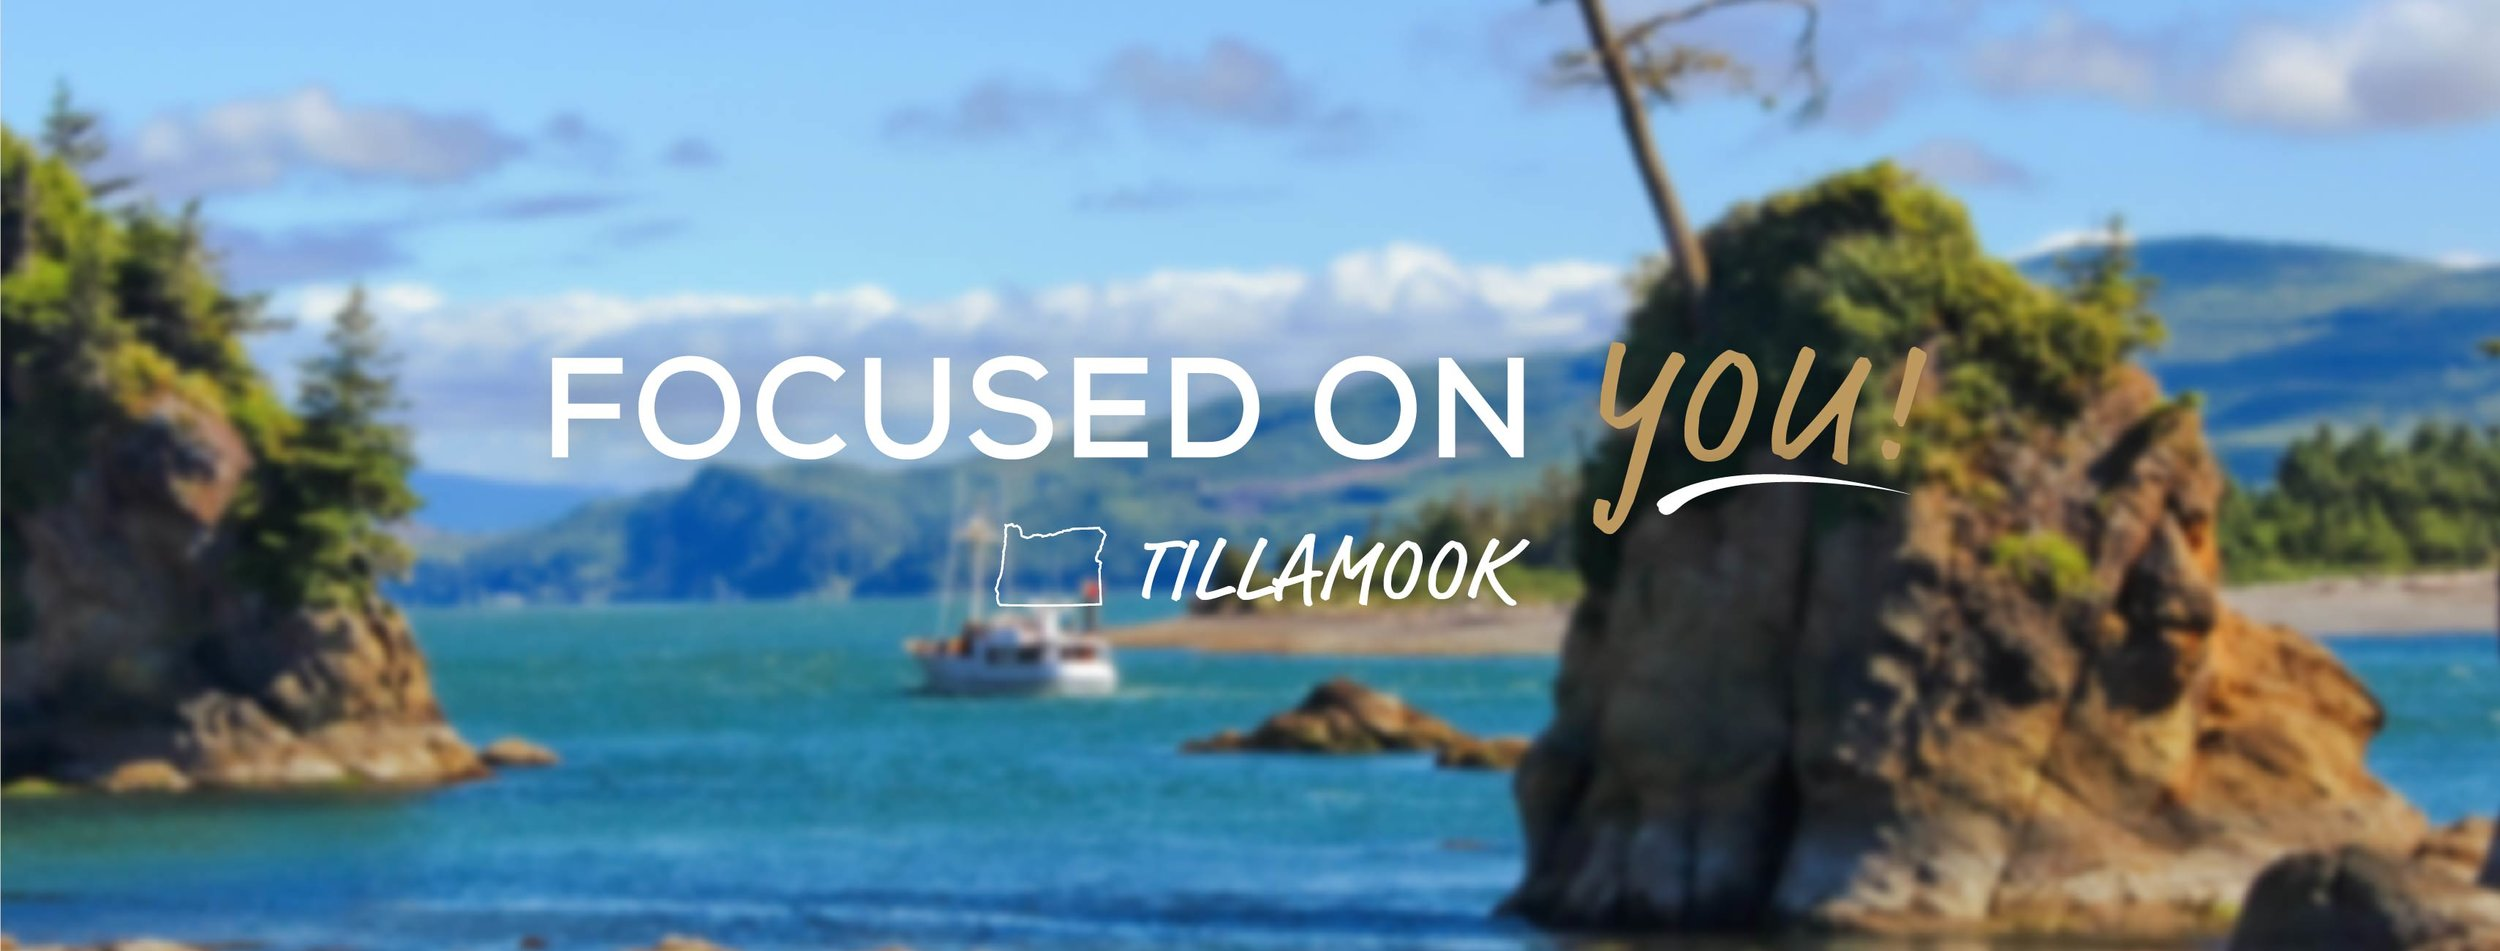 Tillamook - 541.994.6003tillamook@directorsmortgage.net115 Main Ave, Unit 6 Tillamook, Oregon 97141